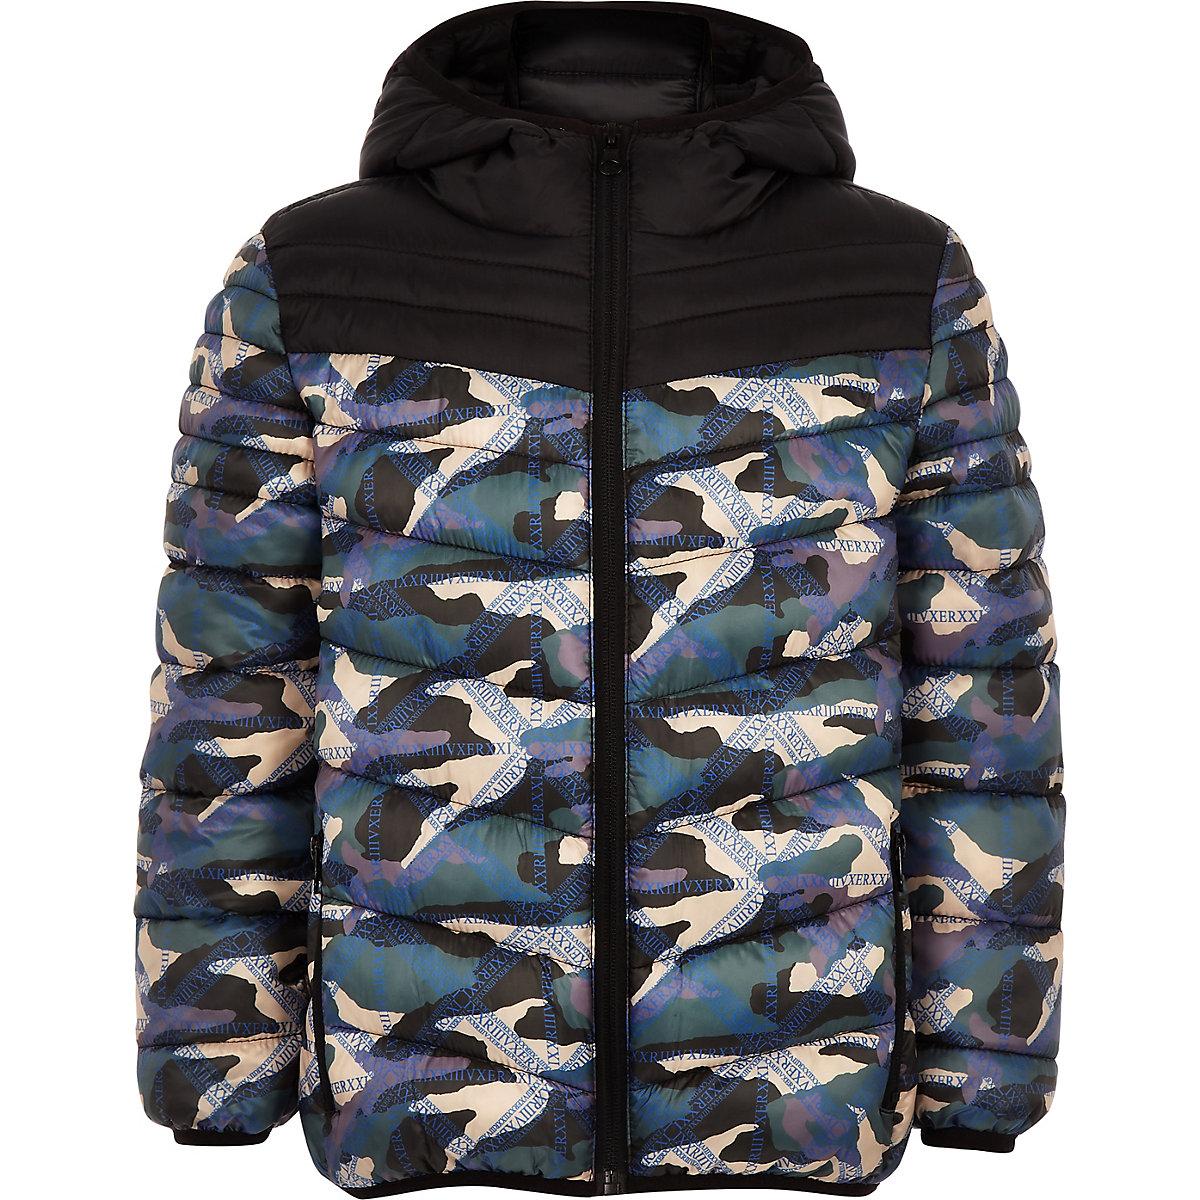 Boys black camo puffer jacket